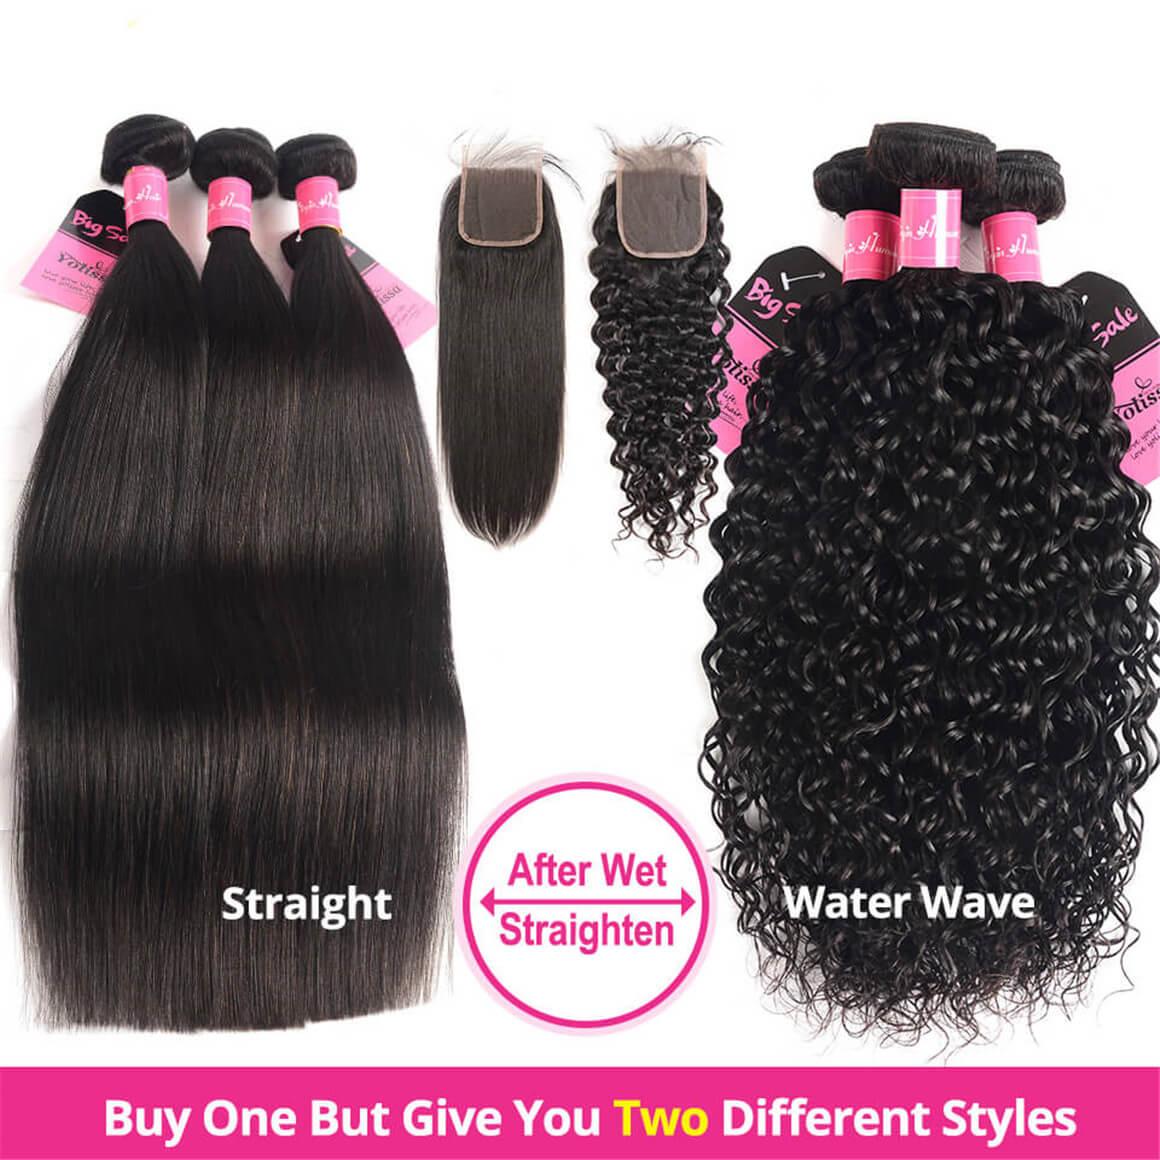 Wet And Wavy Water Wave Hair Bundles